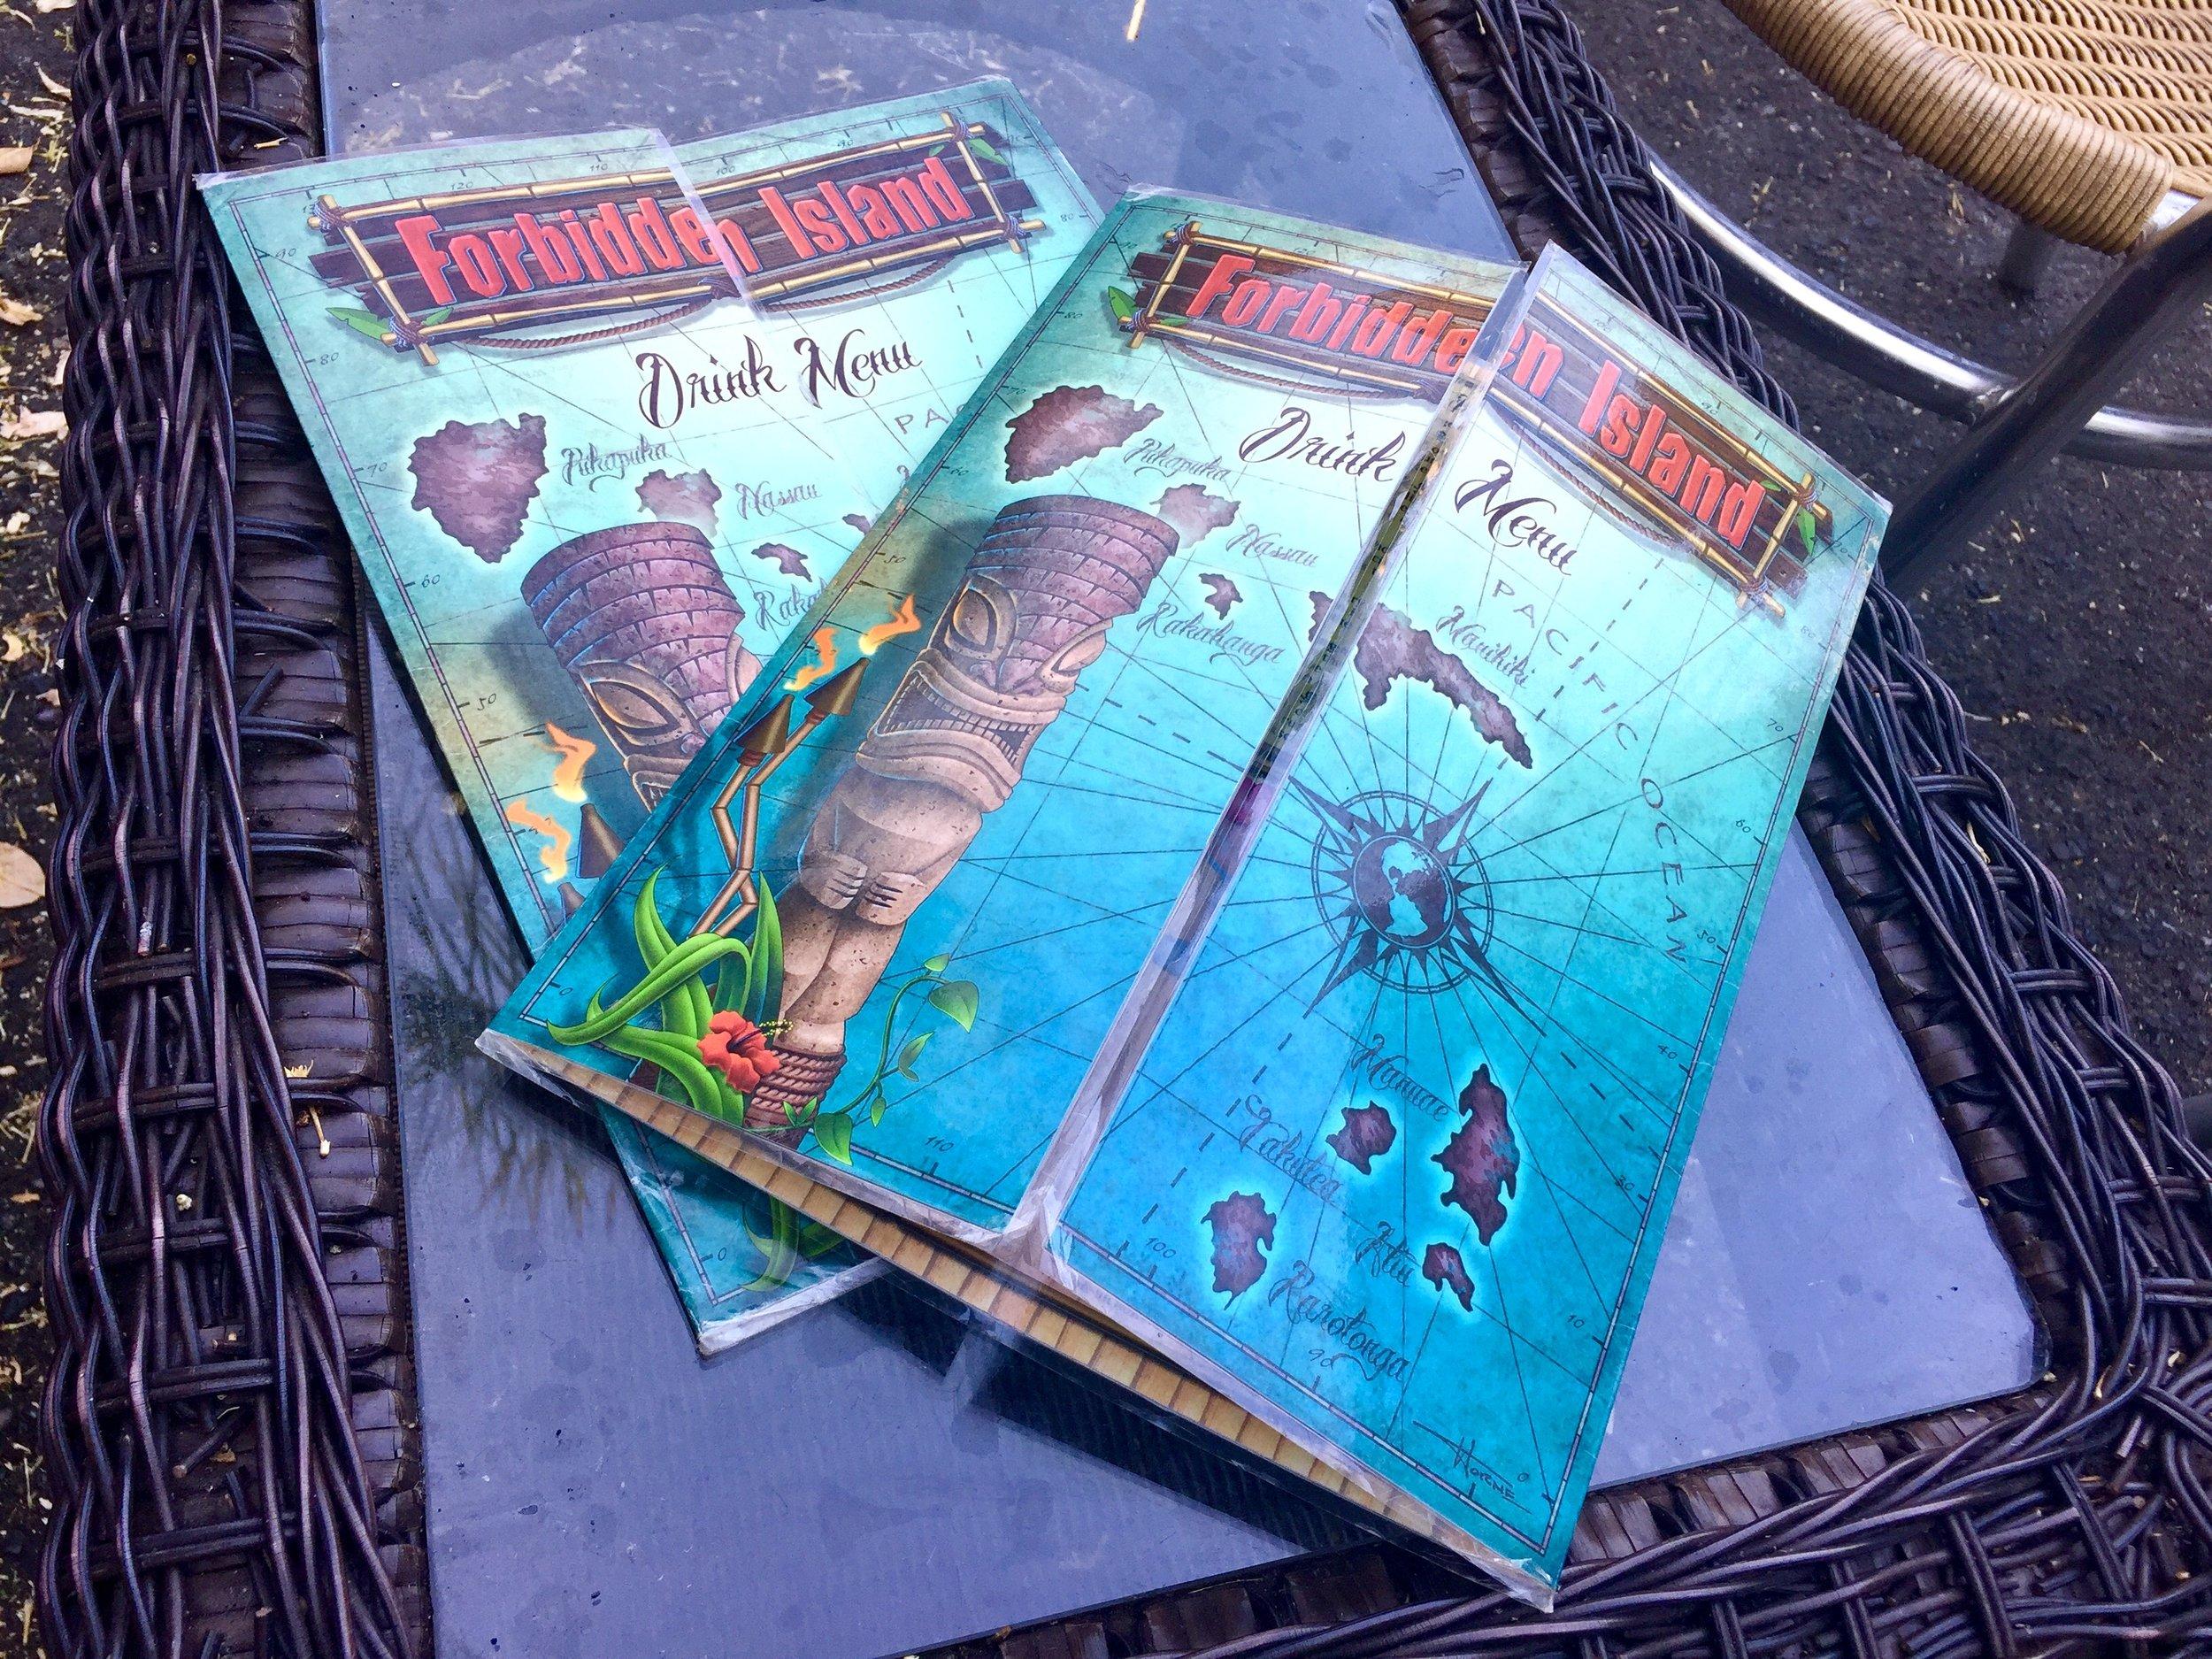 Forbidden Island's menu...